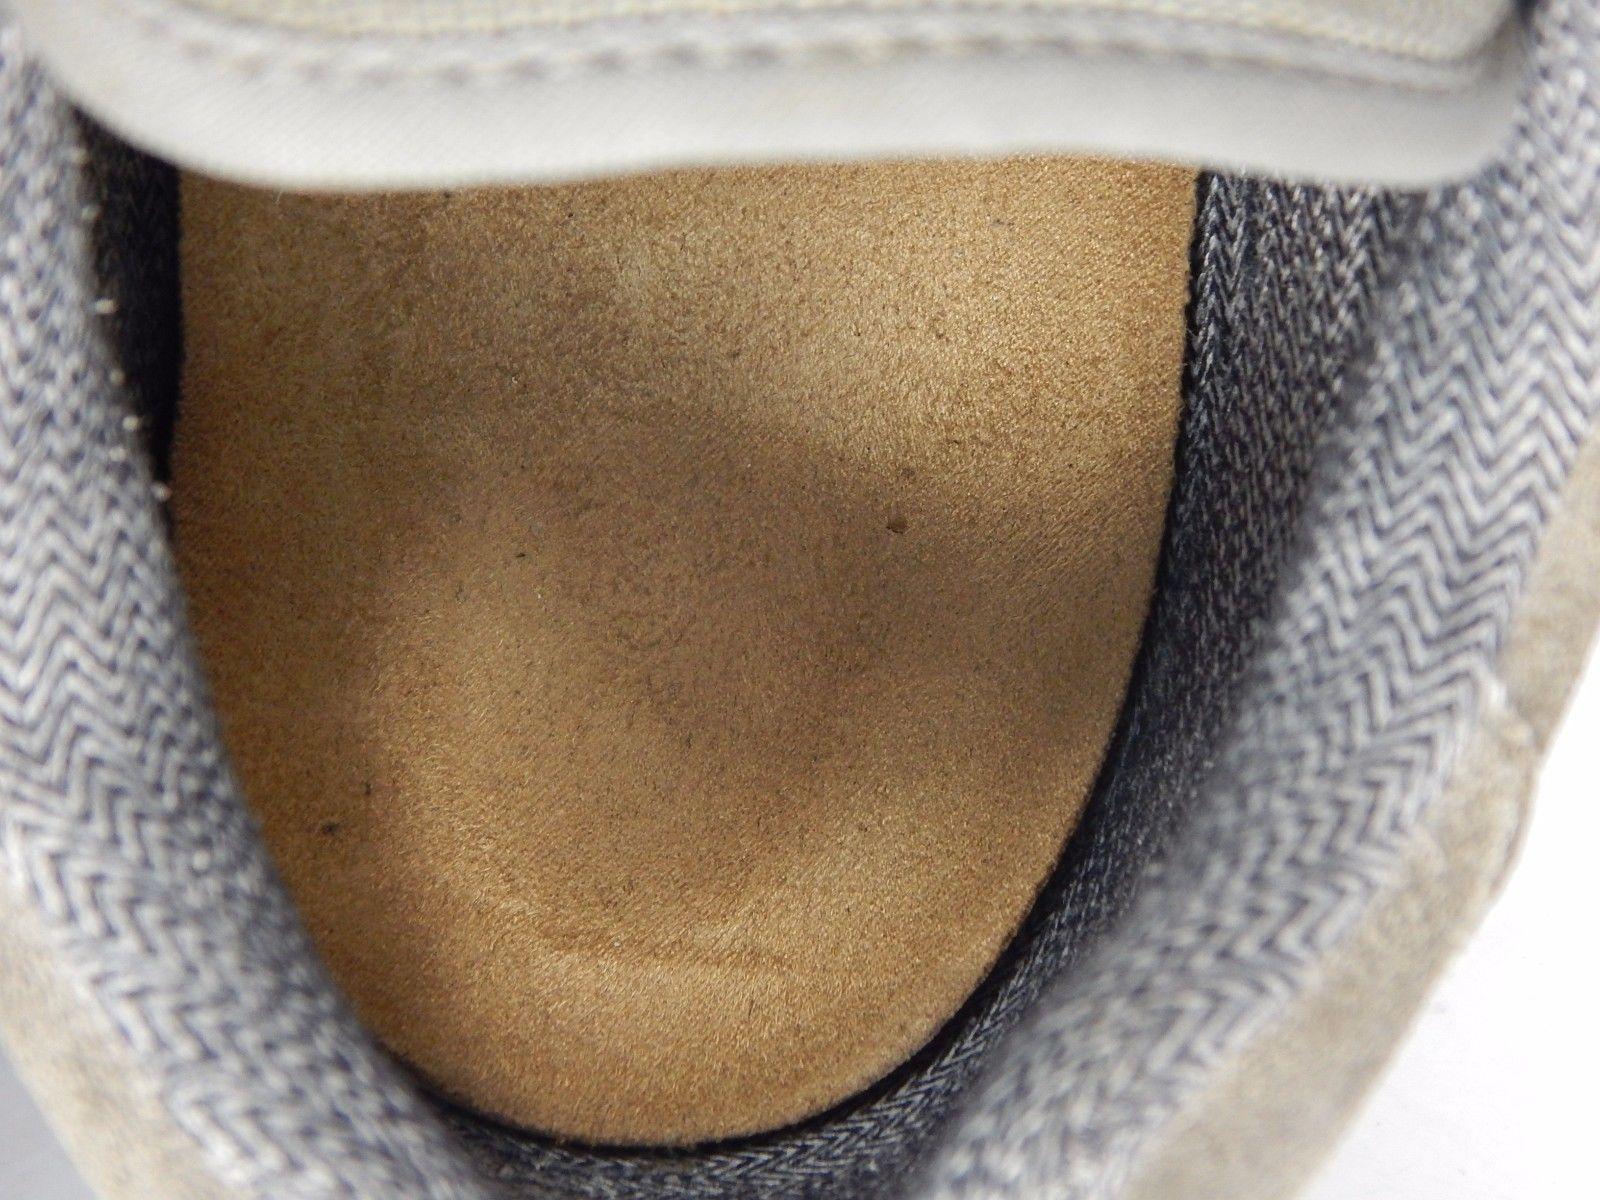 Raichle Low Cut Brown Nubuck Leather Hiking Shoes Size US 13 M (D) EU 47